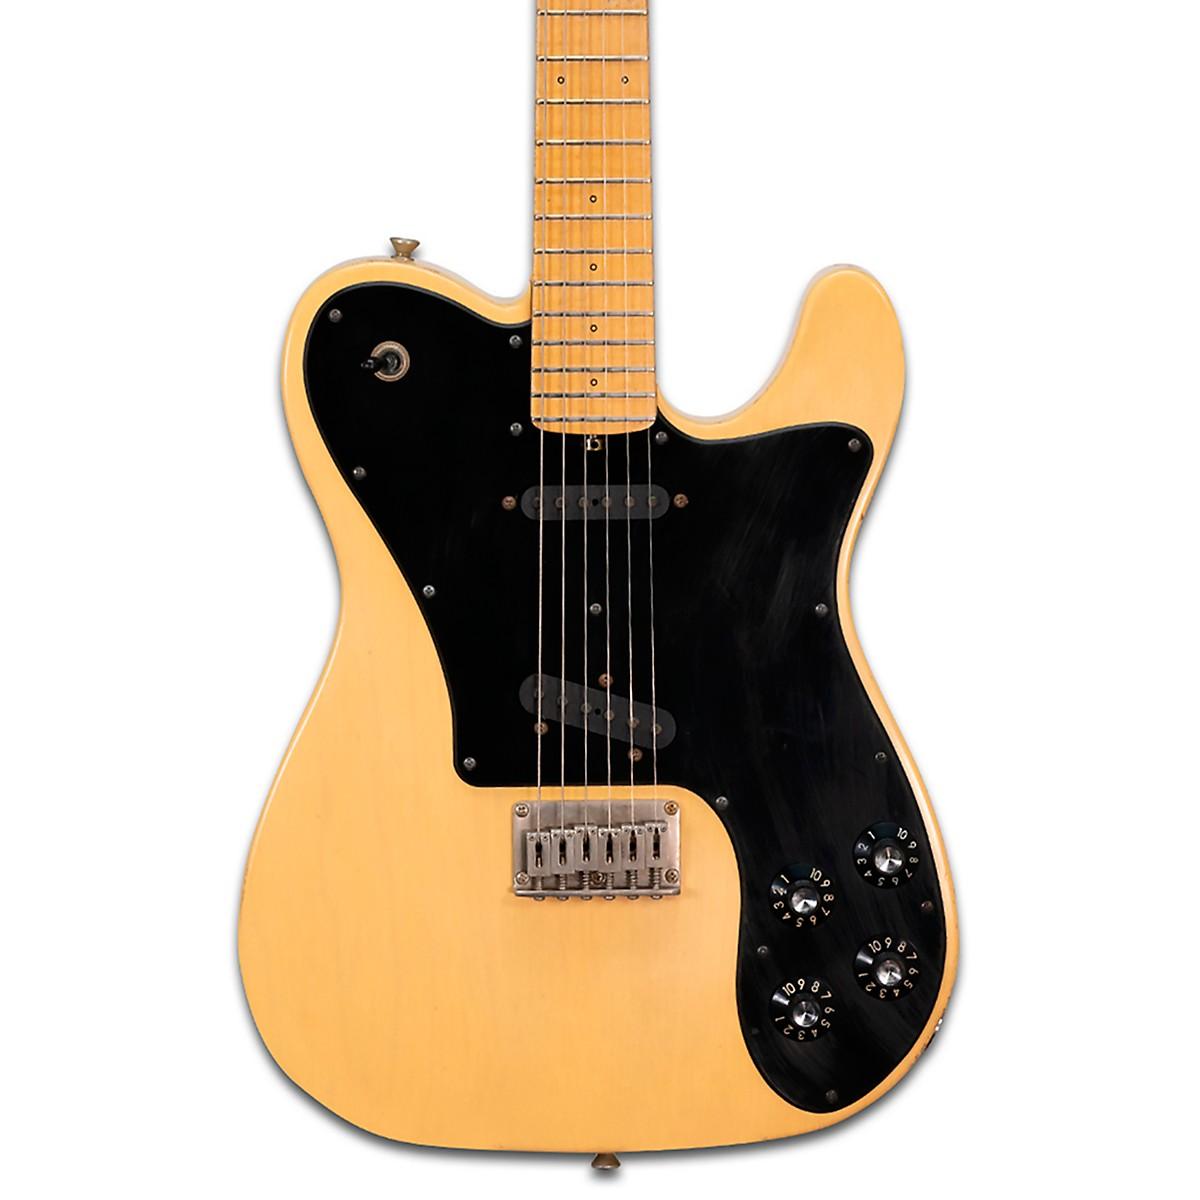 Friedman Vintage-T Electric Guitar